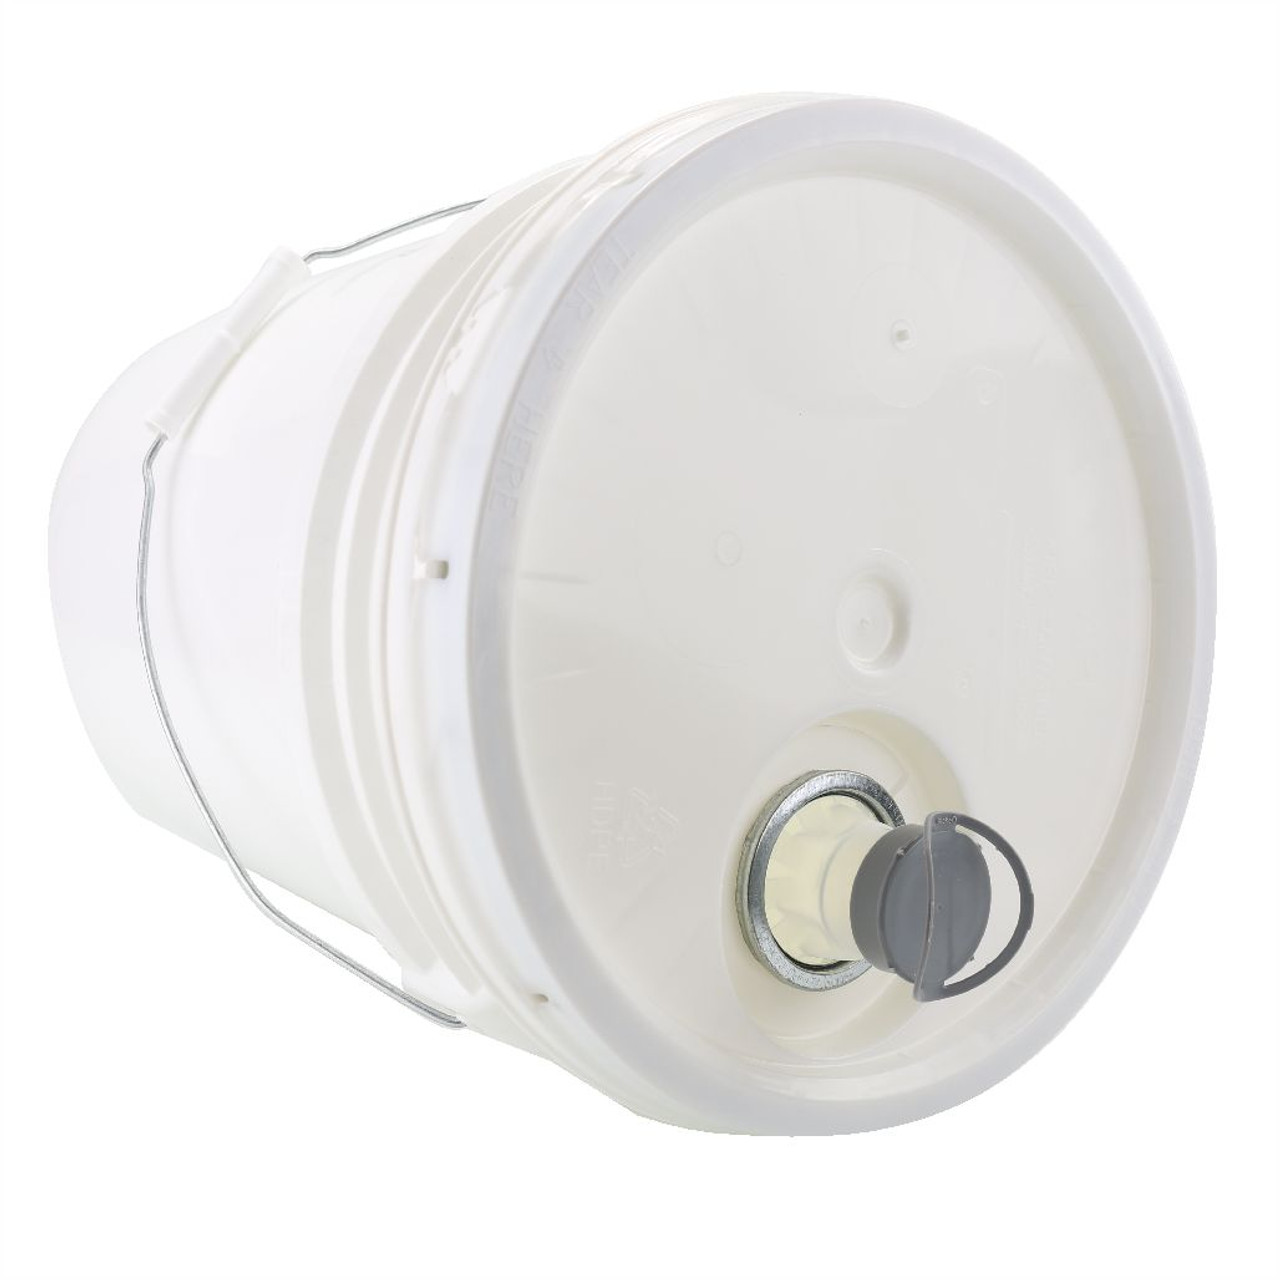 Top View of Kelco™ 5 Gallon Shampoo Bucket